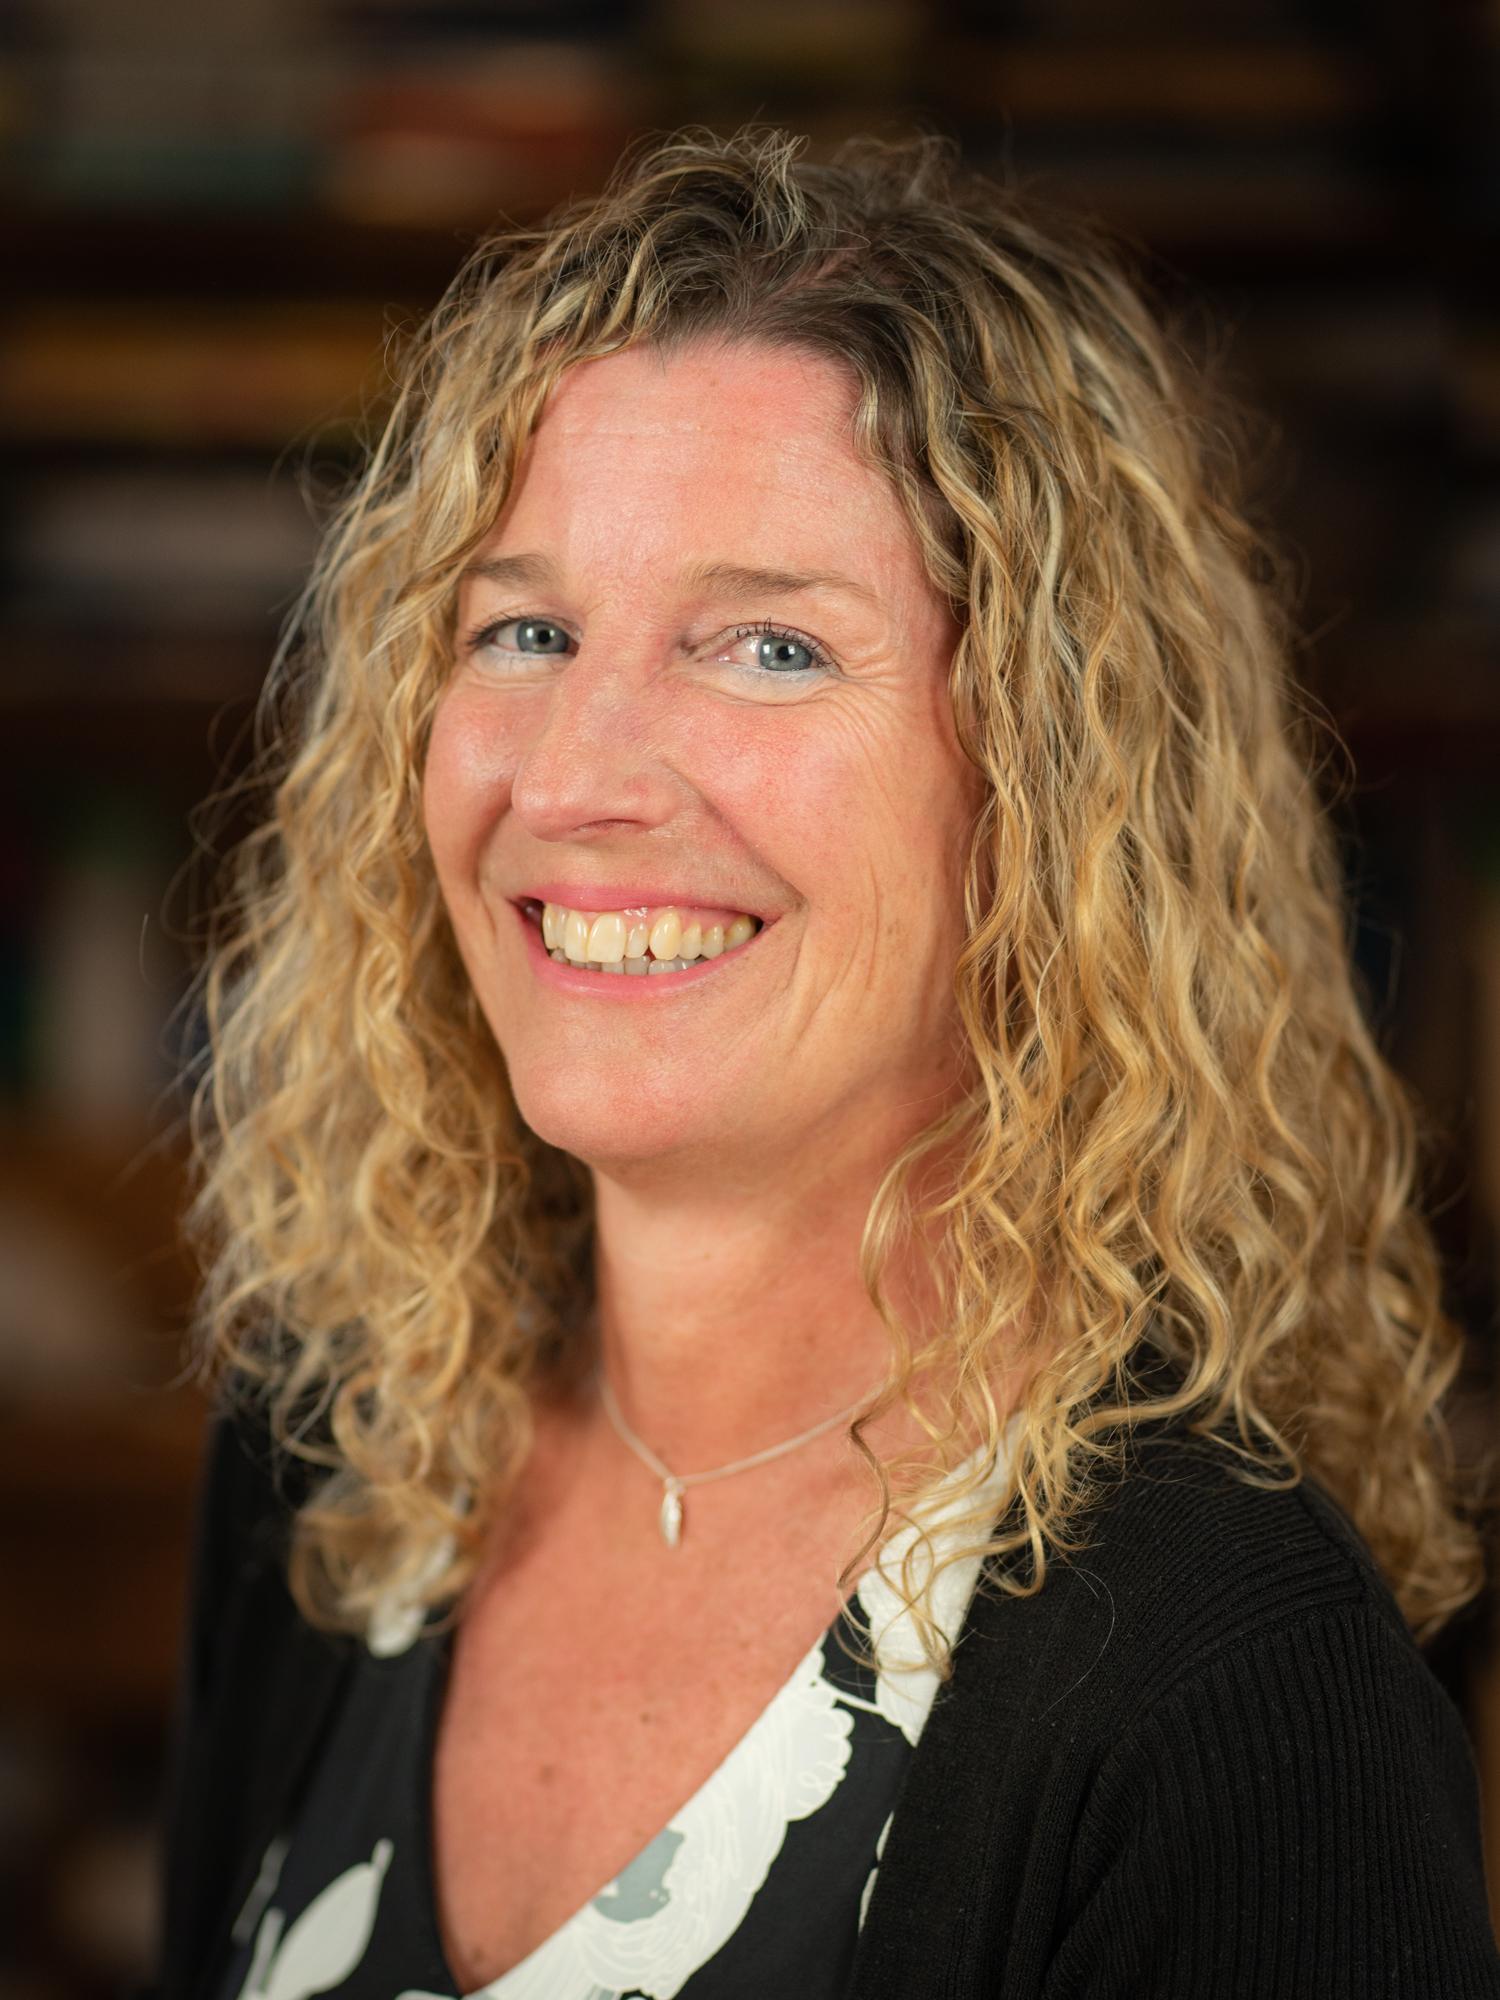 Louise Hinson